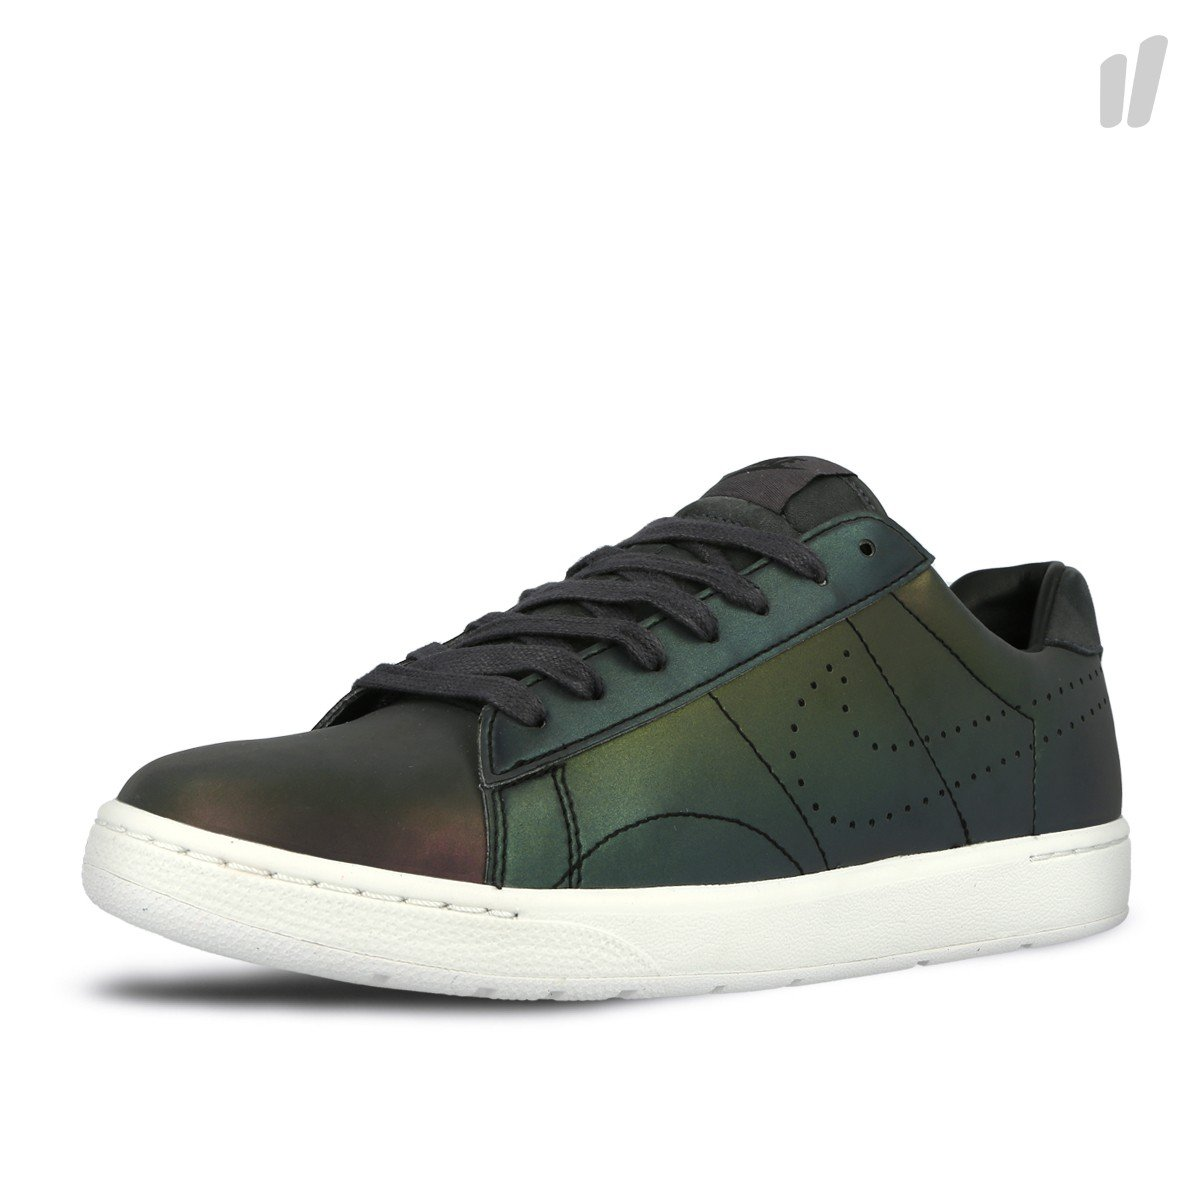 free shipping 03587 7d631 Amazon.com  Nike 830699 001 Tennis Classic Ultra Premium Quick Strike Size  8.5 Black (Black Black-Anthracite-Ivory)  Clothing